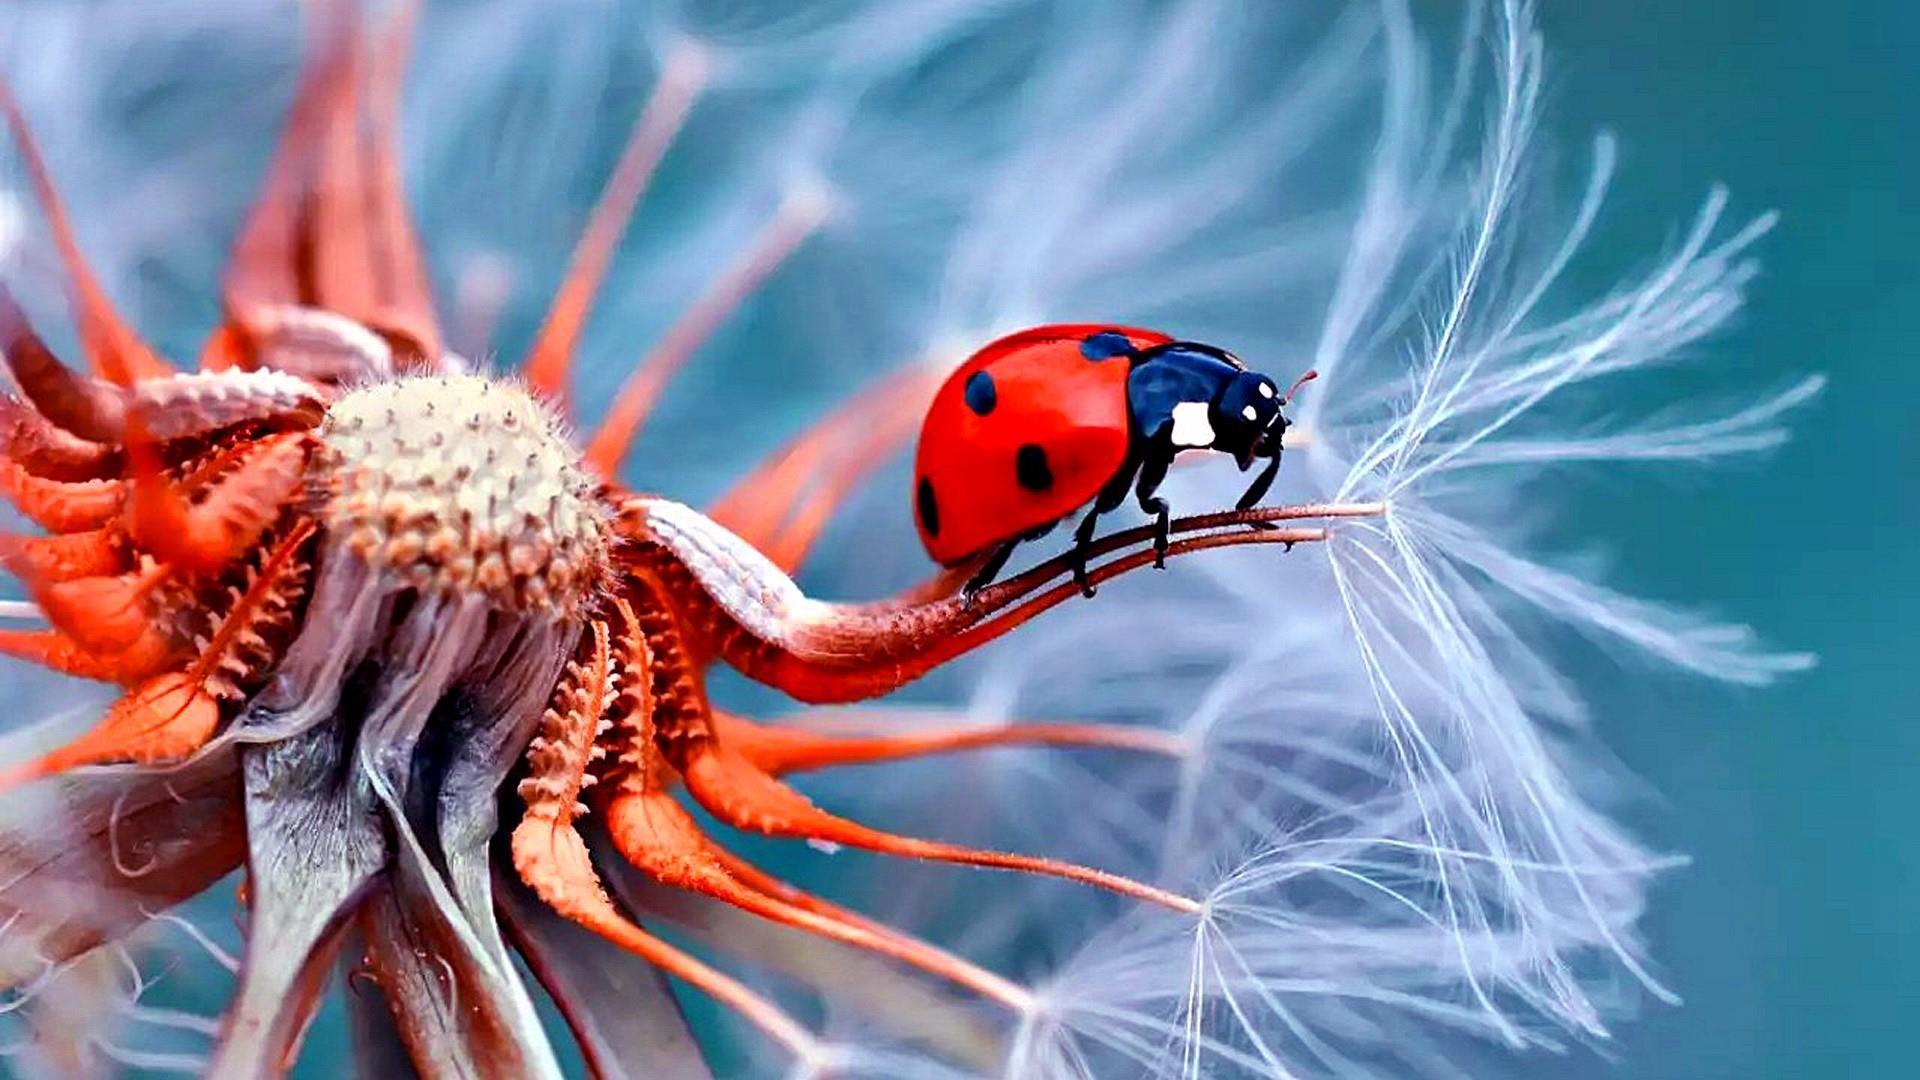 Ladybug Wallpaper 72 Images